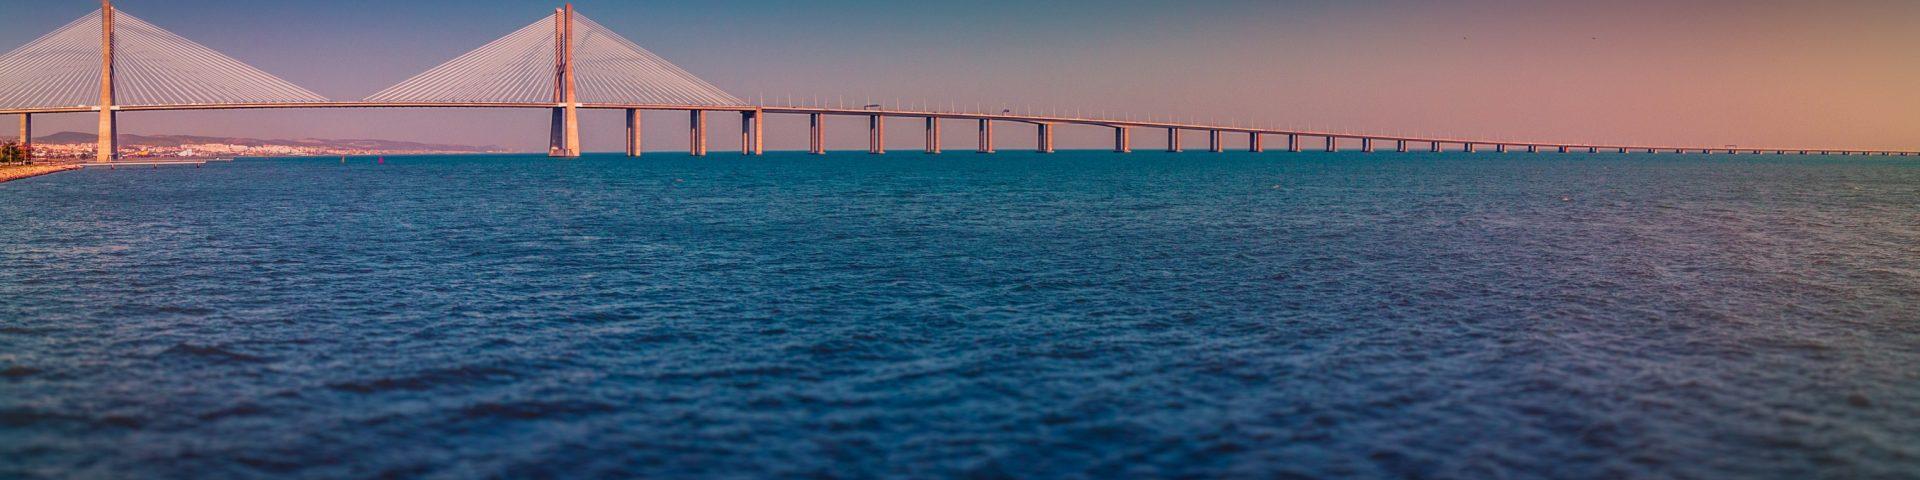 Vasco Gama bridge